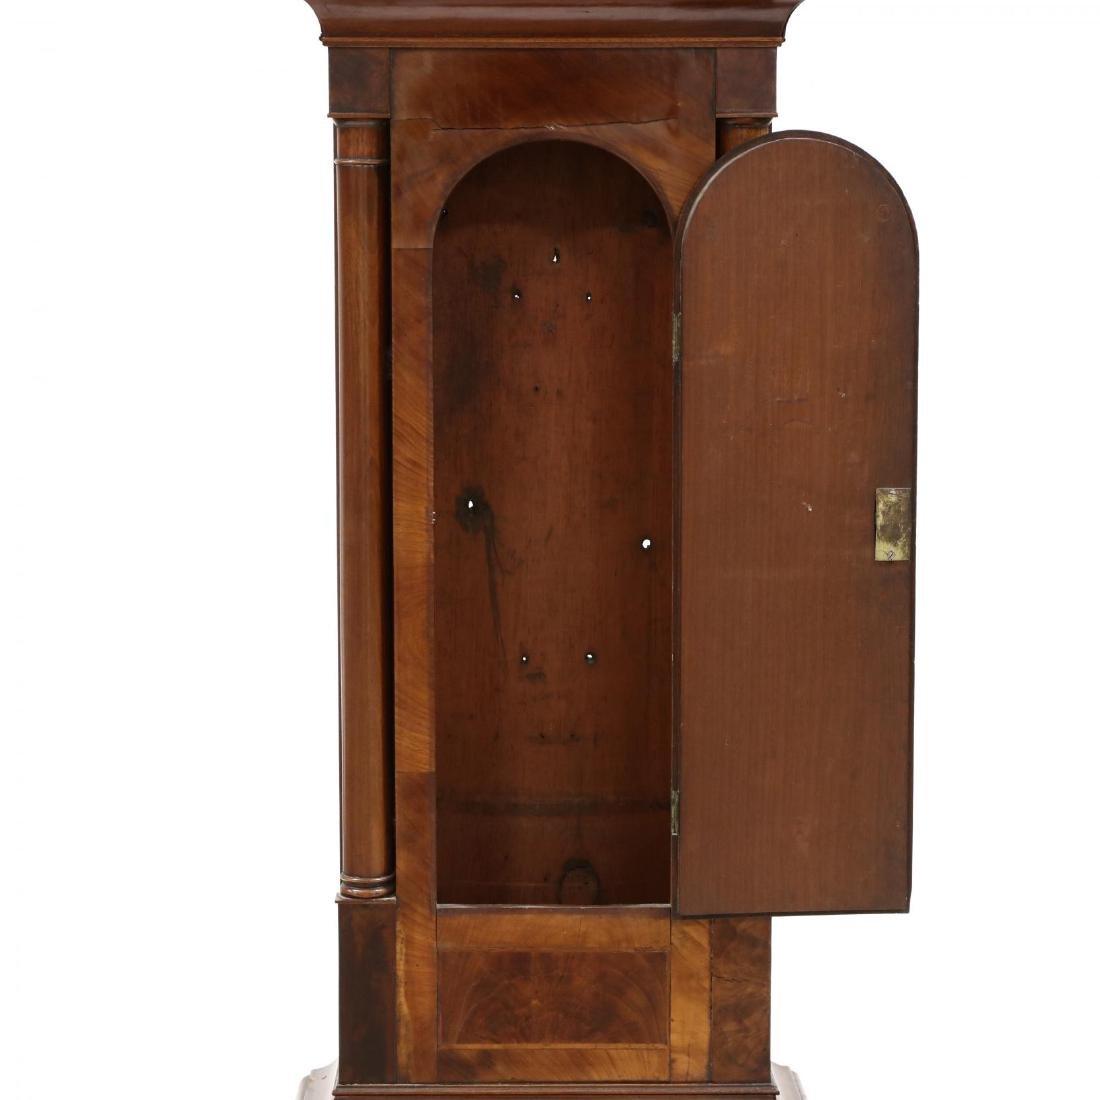 Scottish Mahogany Tall Case Clock, Hay Mercer, Aberdeen - 4